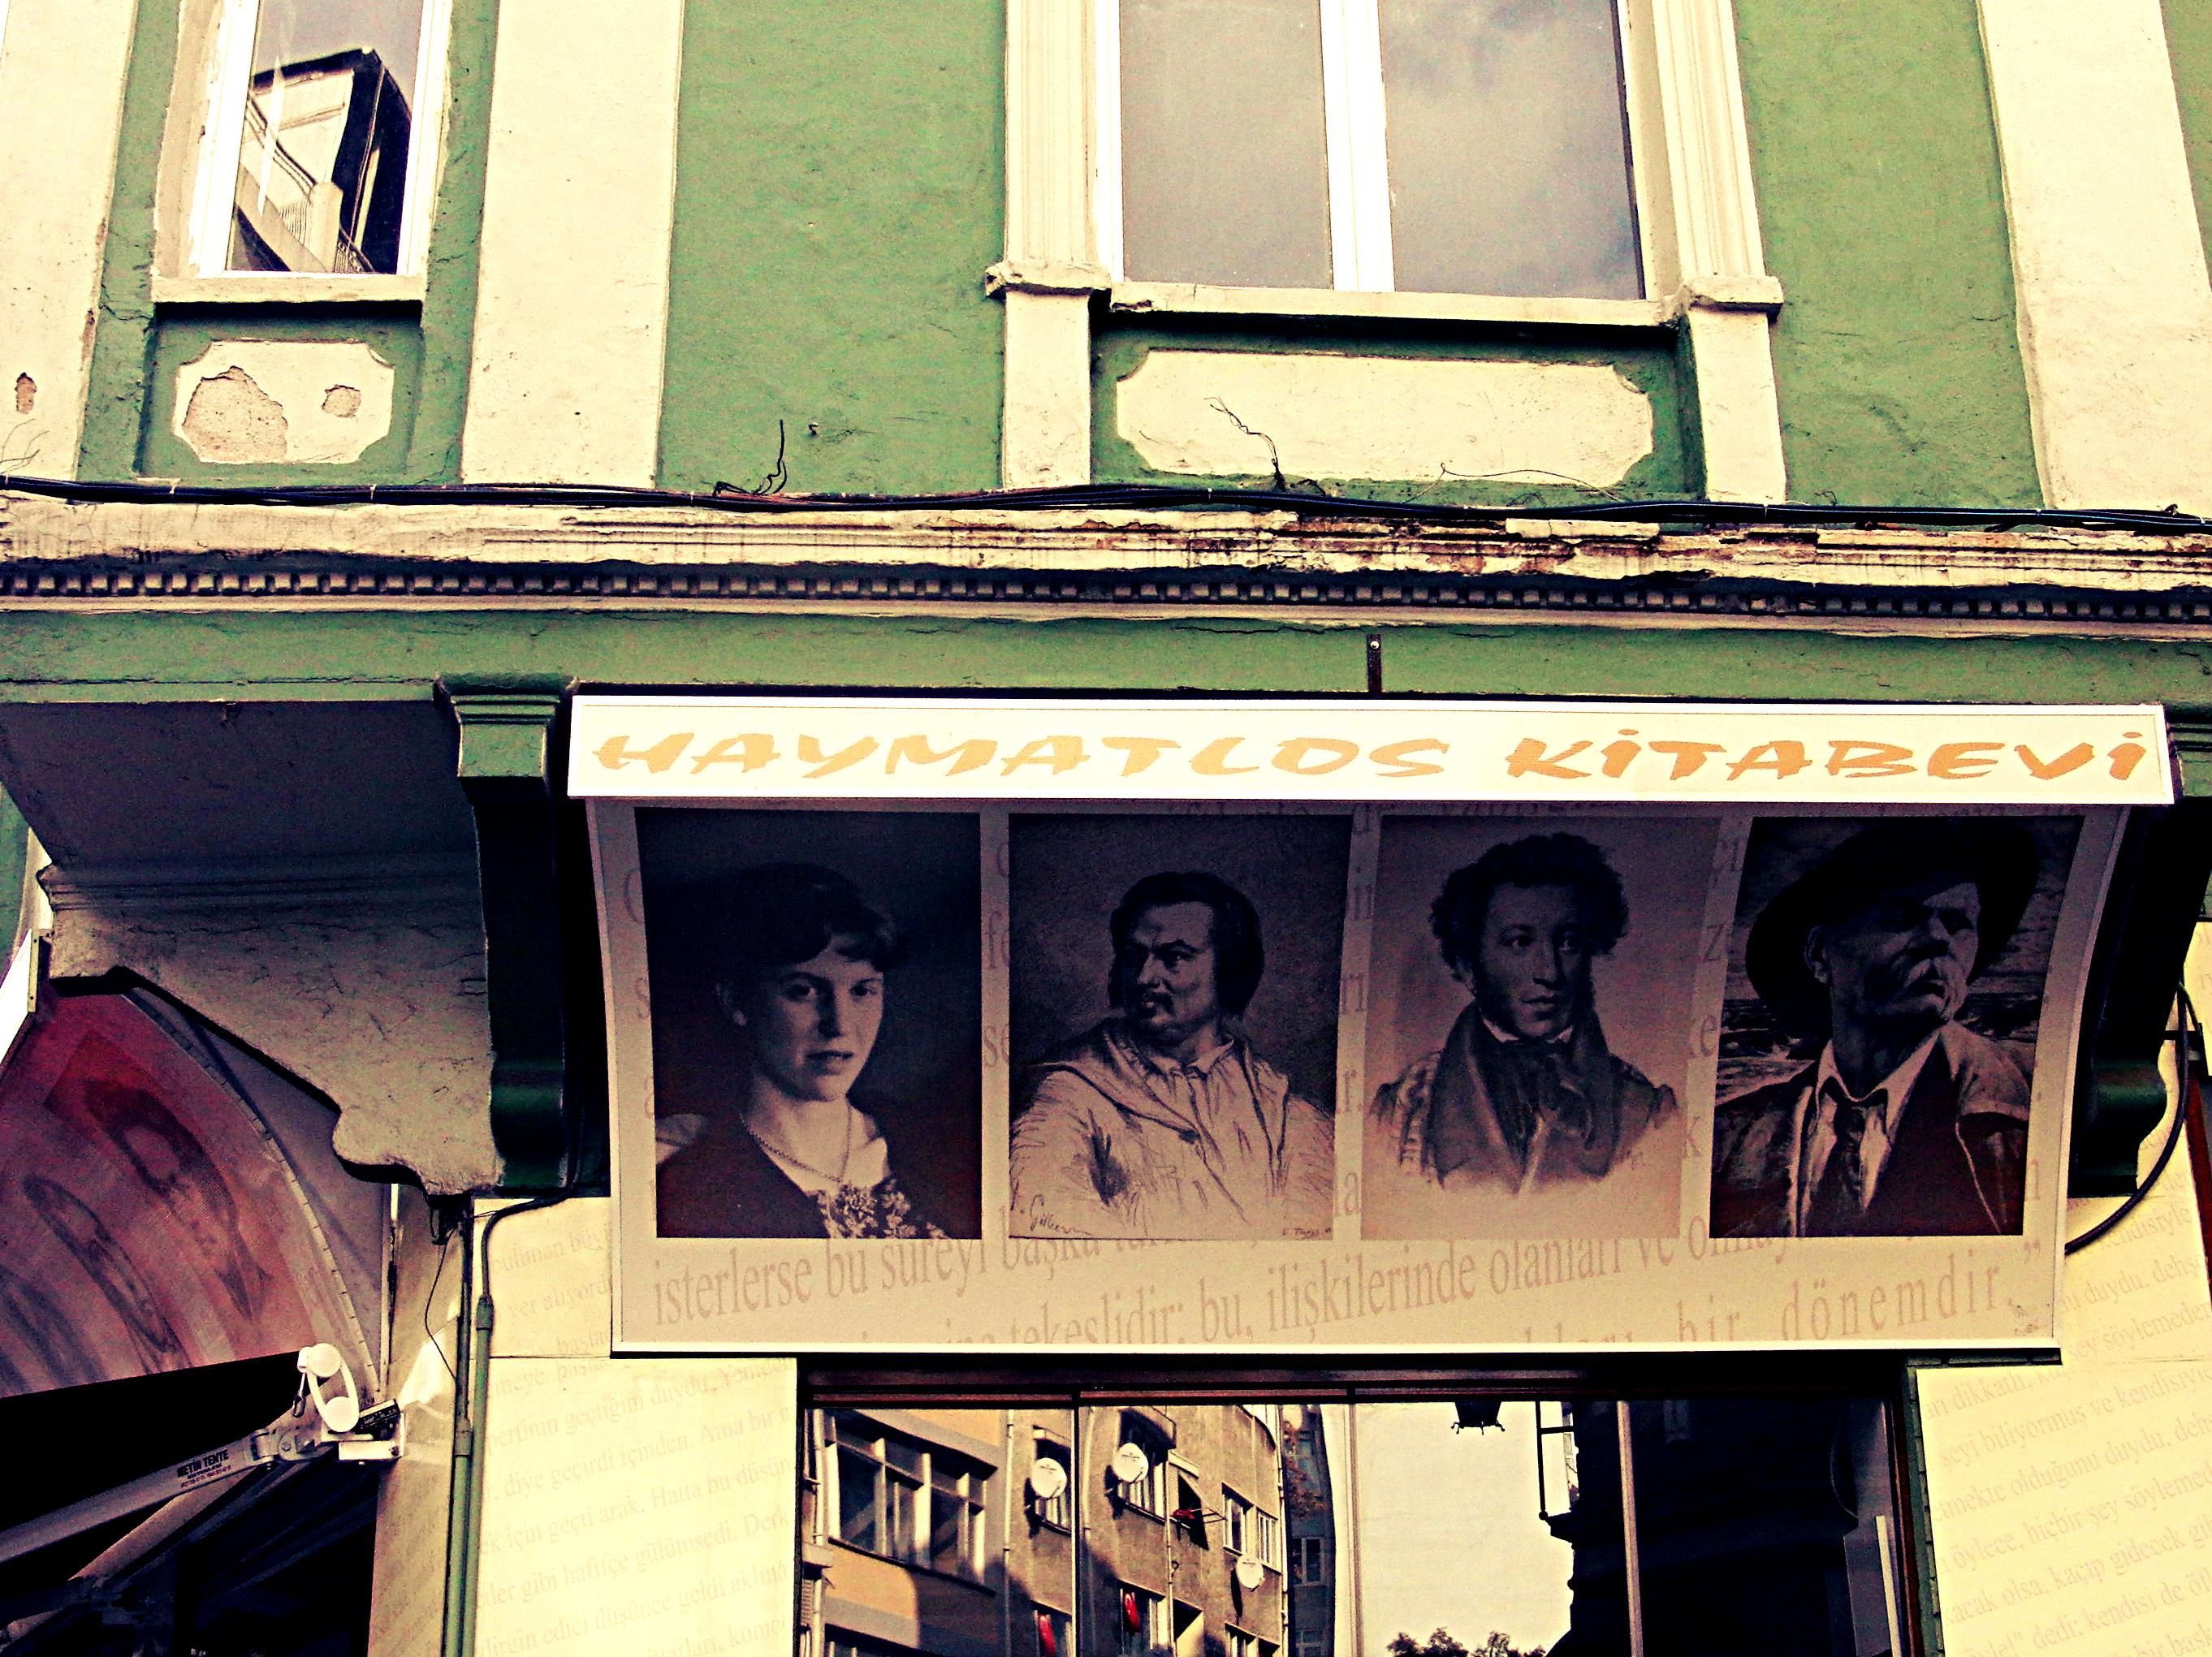 Haymatlos Kitabevi, Buchandlung Haymatlos, İstanbul-Kadıköy, 2013